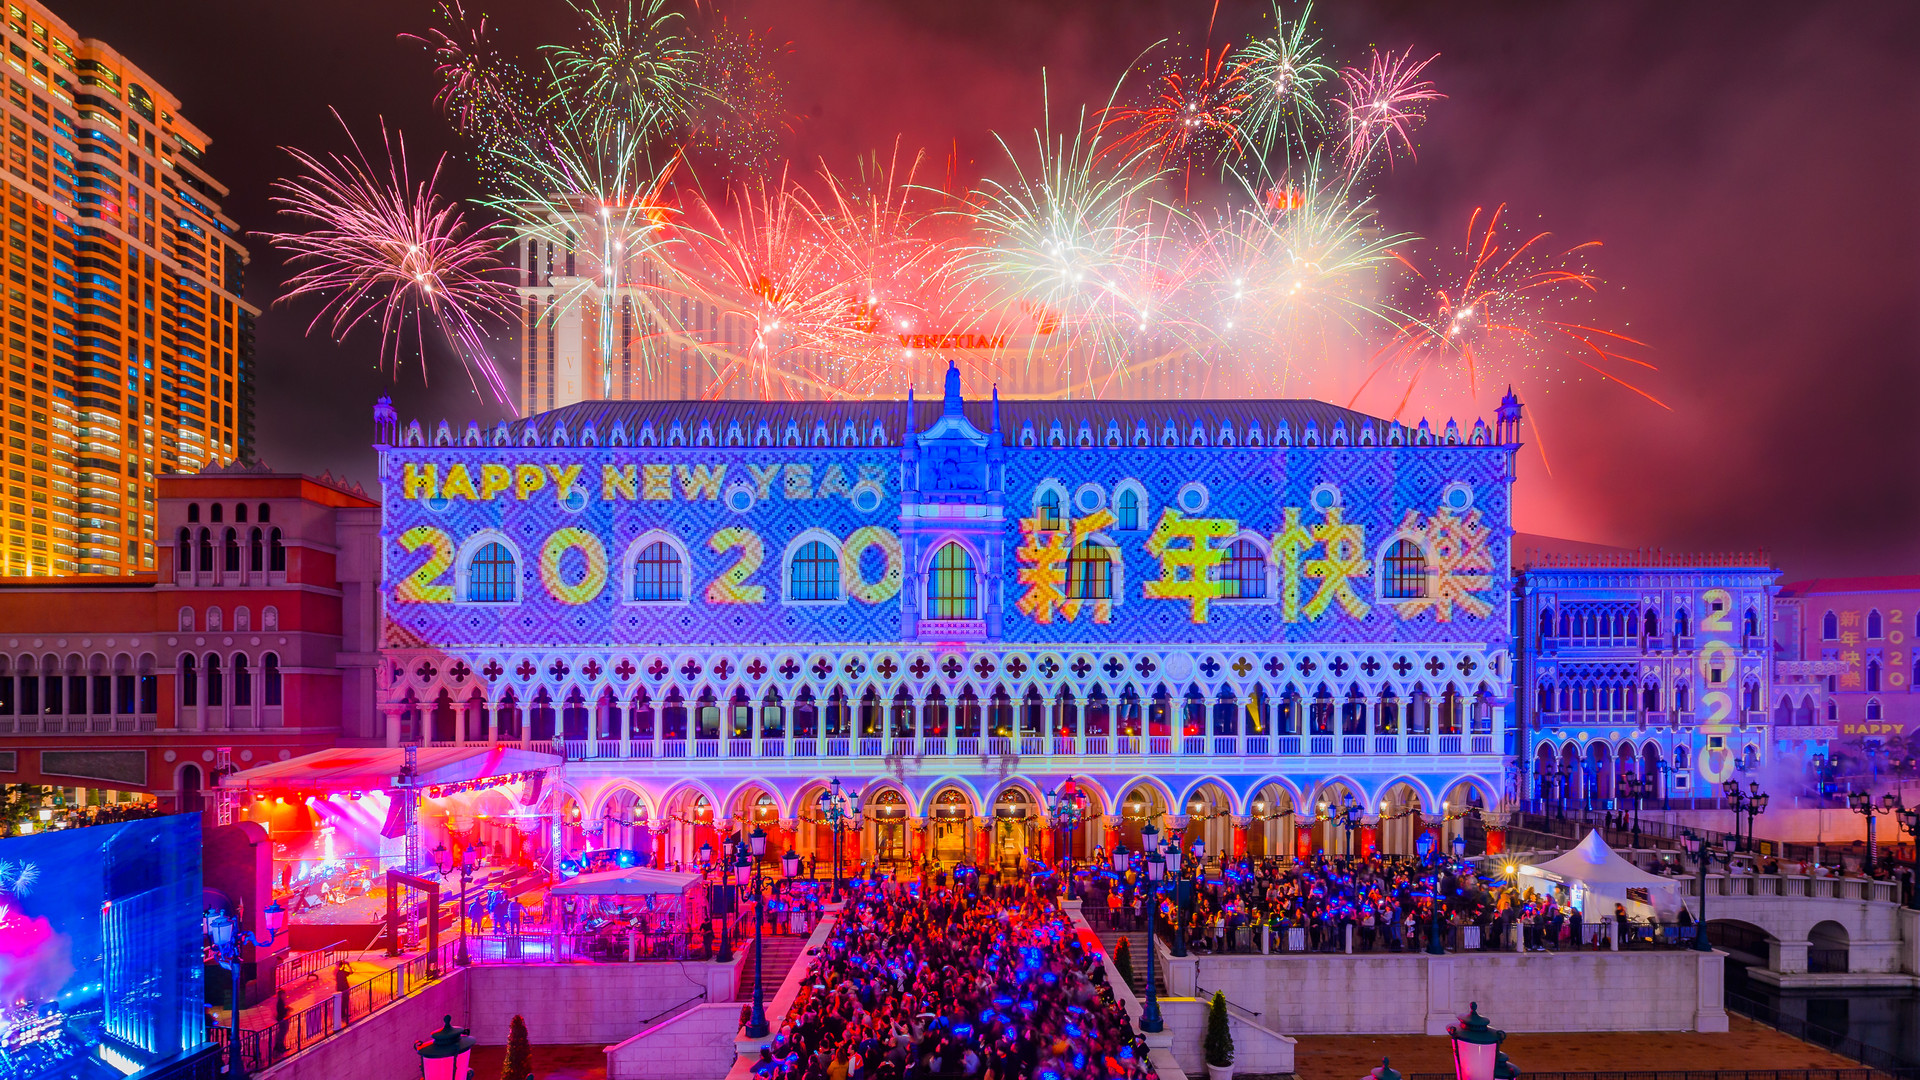 Sands Macau Countdown 2020